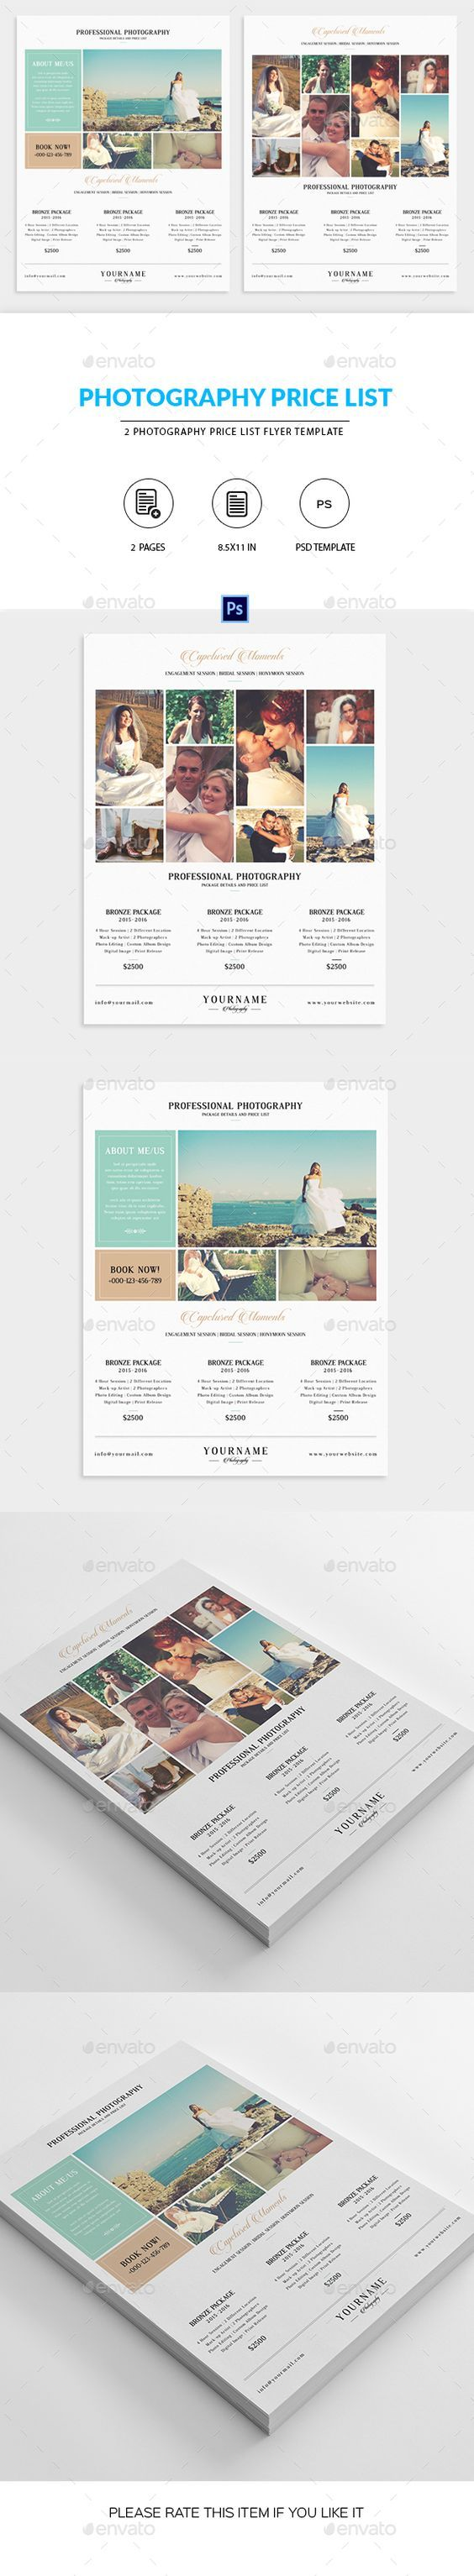 Minimal Photography Price List Marketing Flyer #photoshop elements #price list…